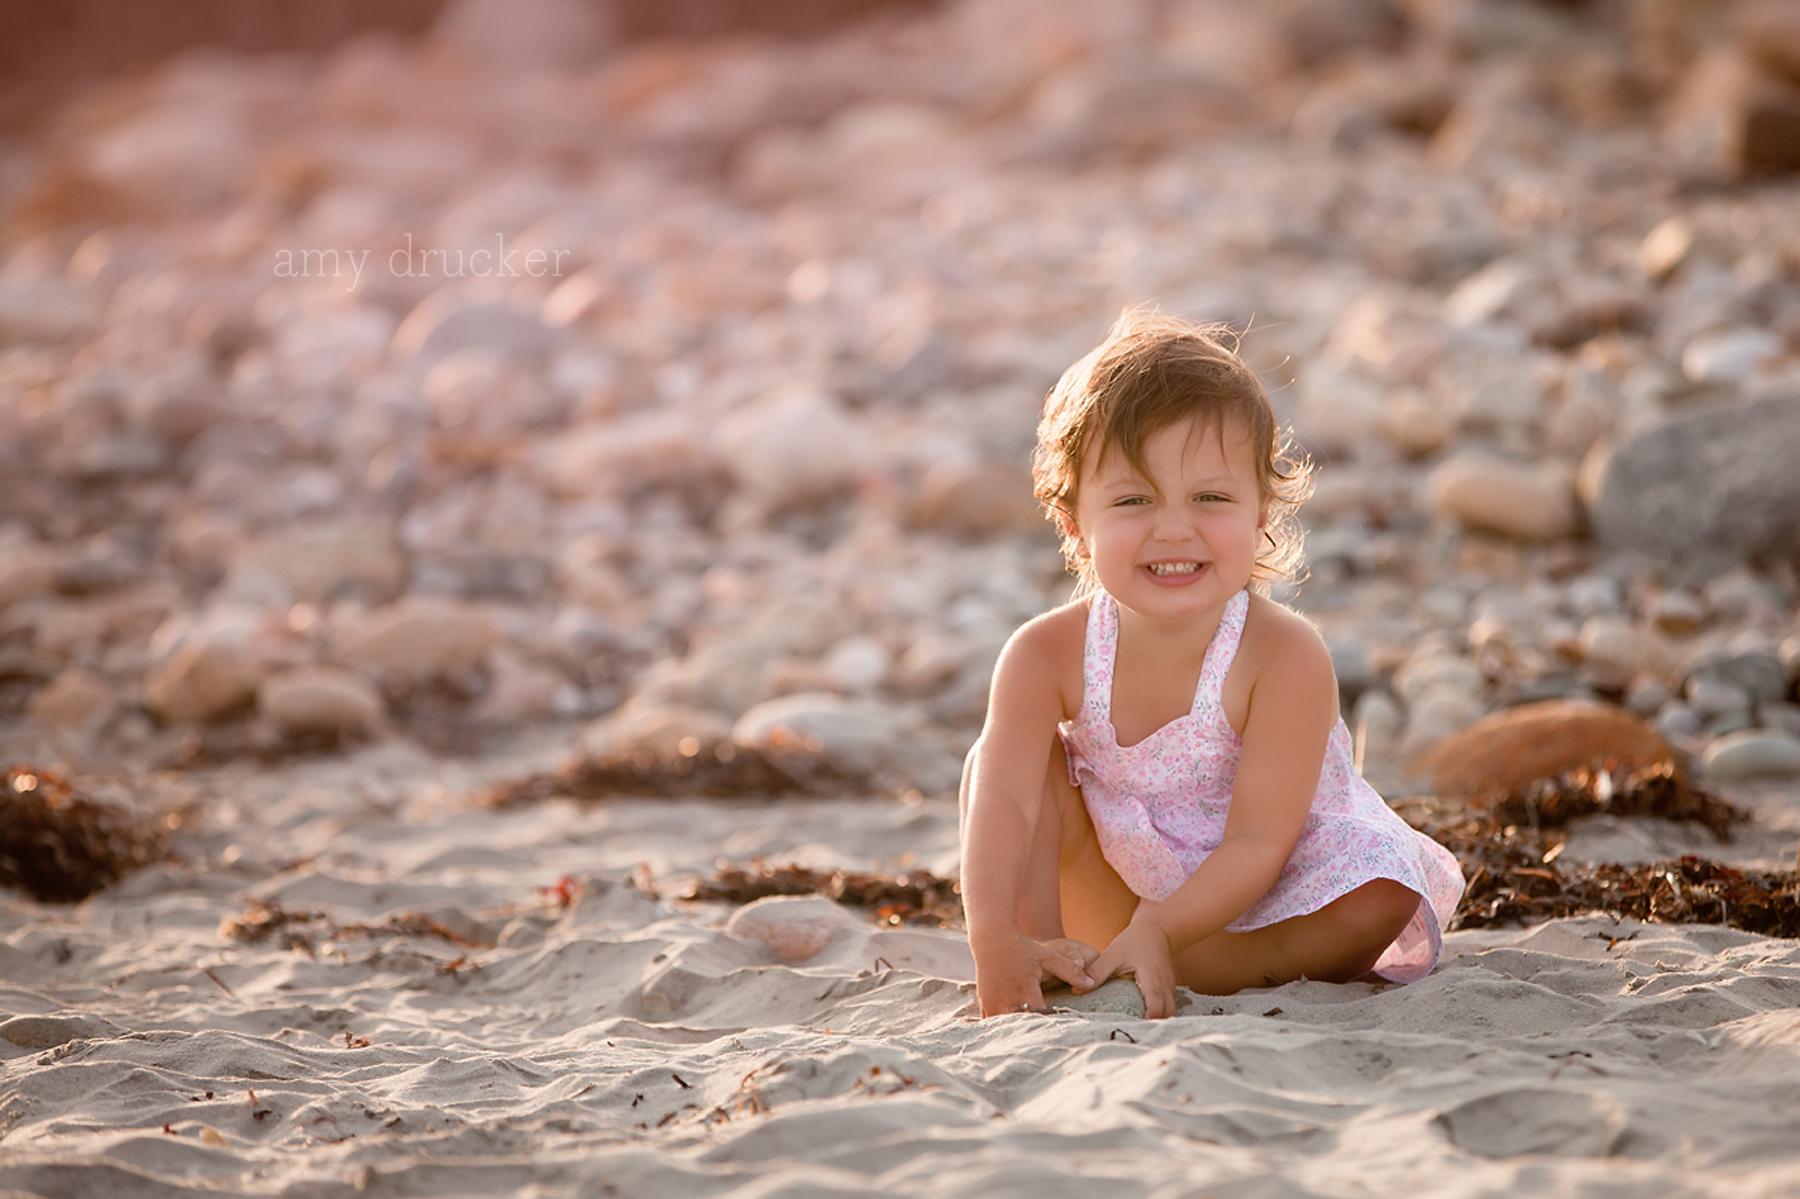 Marthas_Vineyard_Child_Photographer_stonewall_beach_5